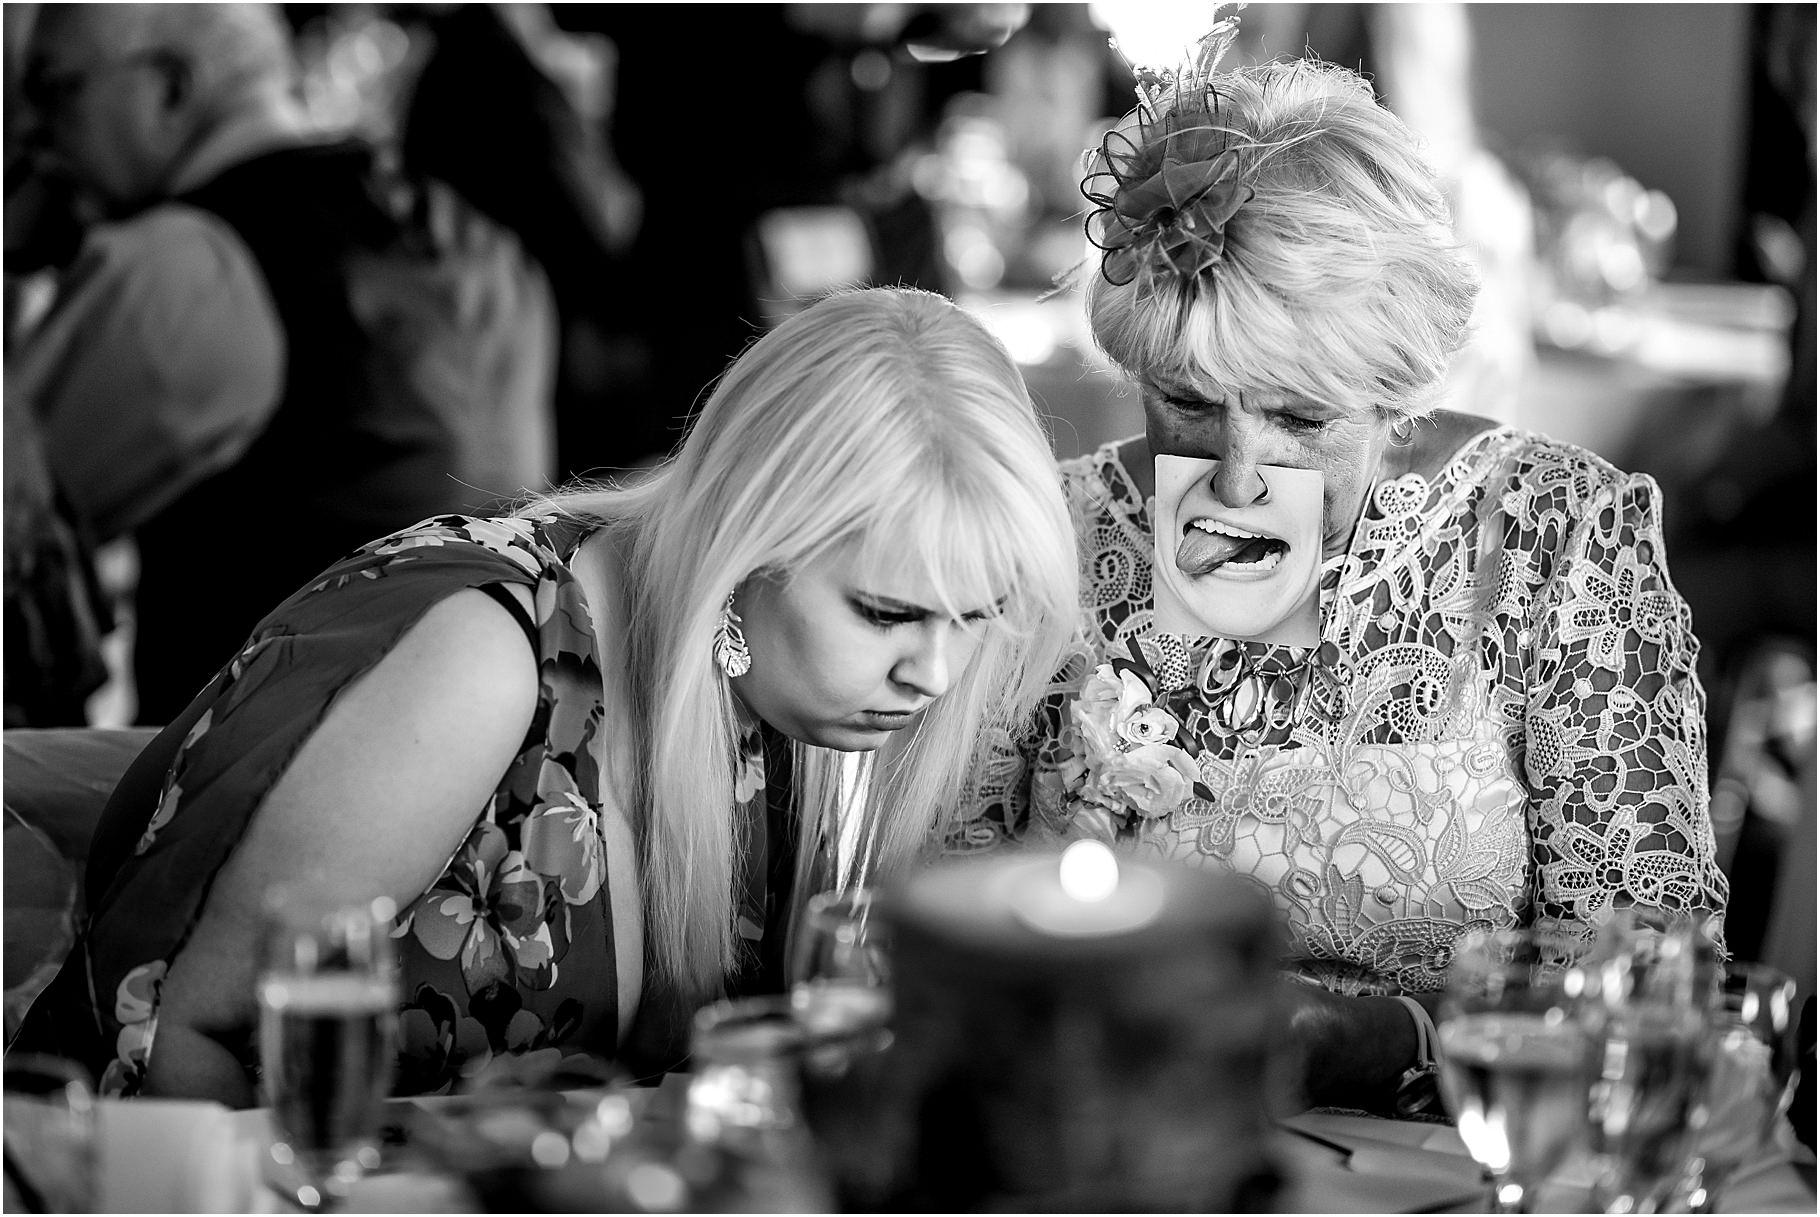 dan-wootton-photography-2017-weddings-169.jpg